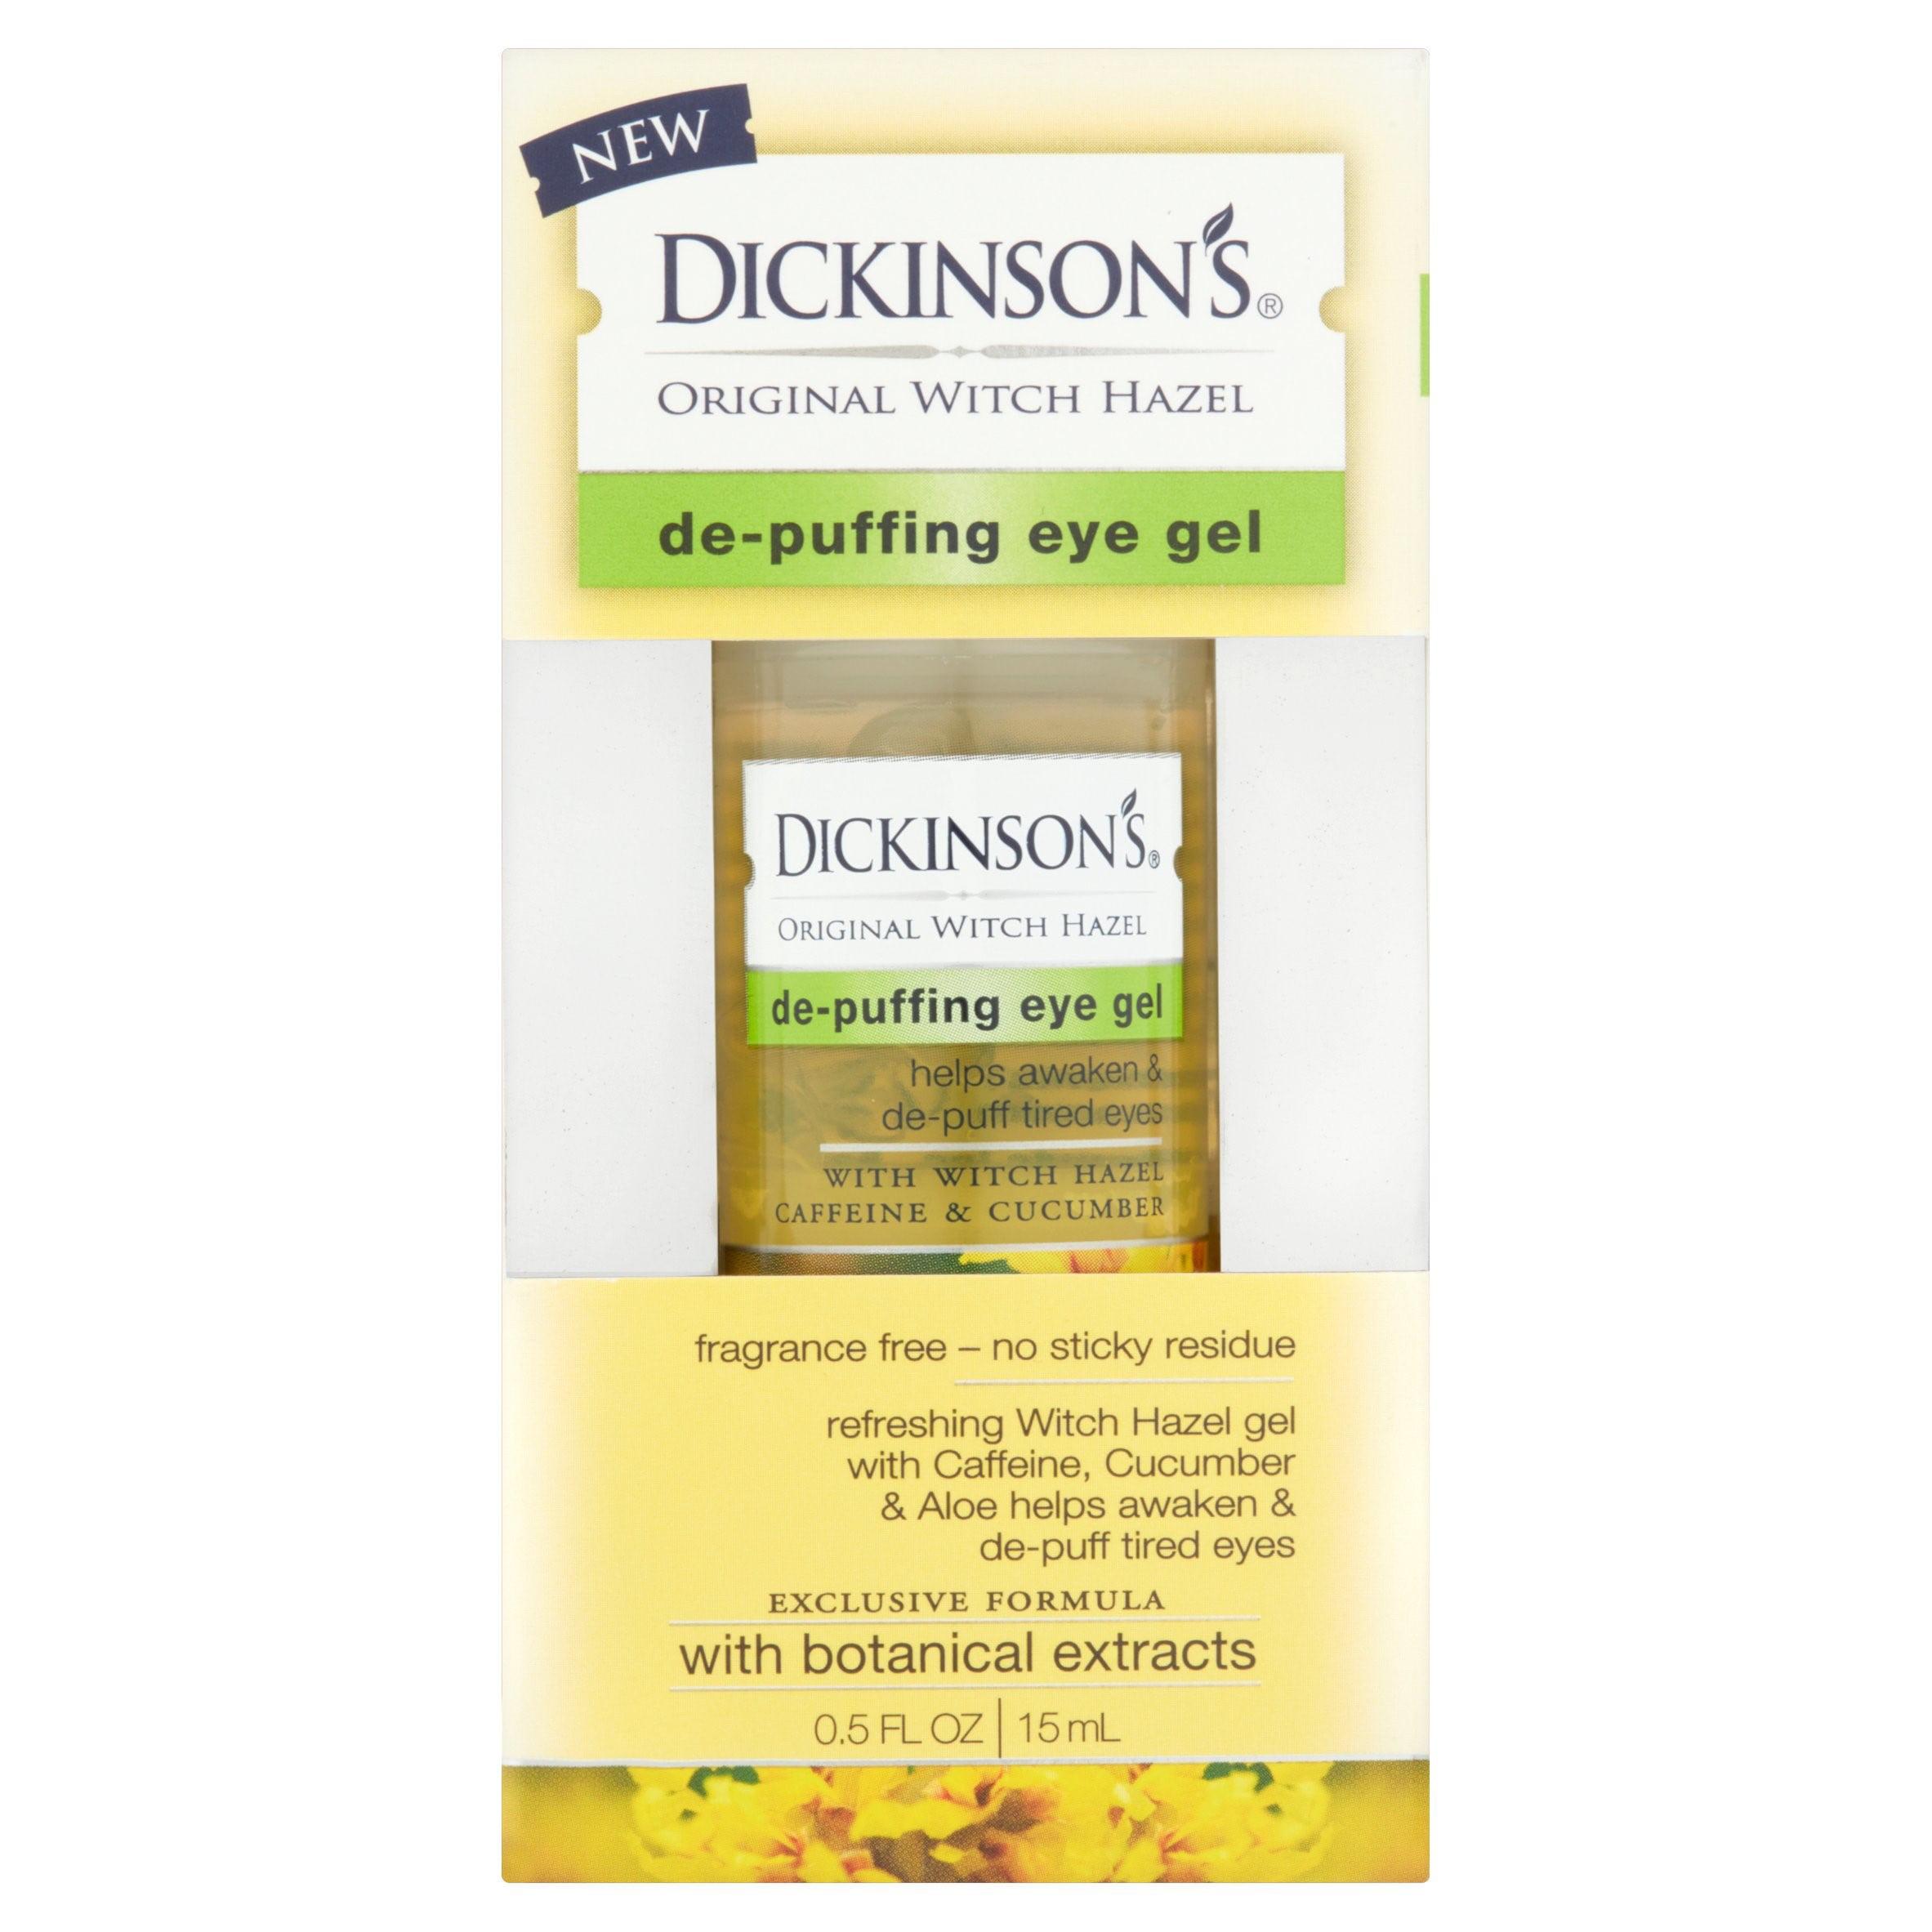 Dickinson's Original Witch Hazel De-Puffing Eye Gel, 0.5 fl oz